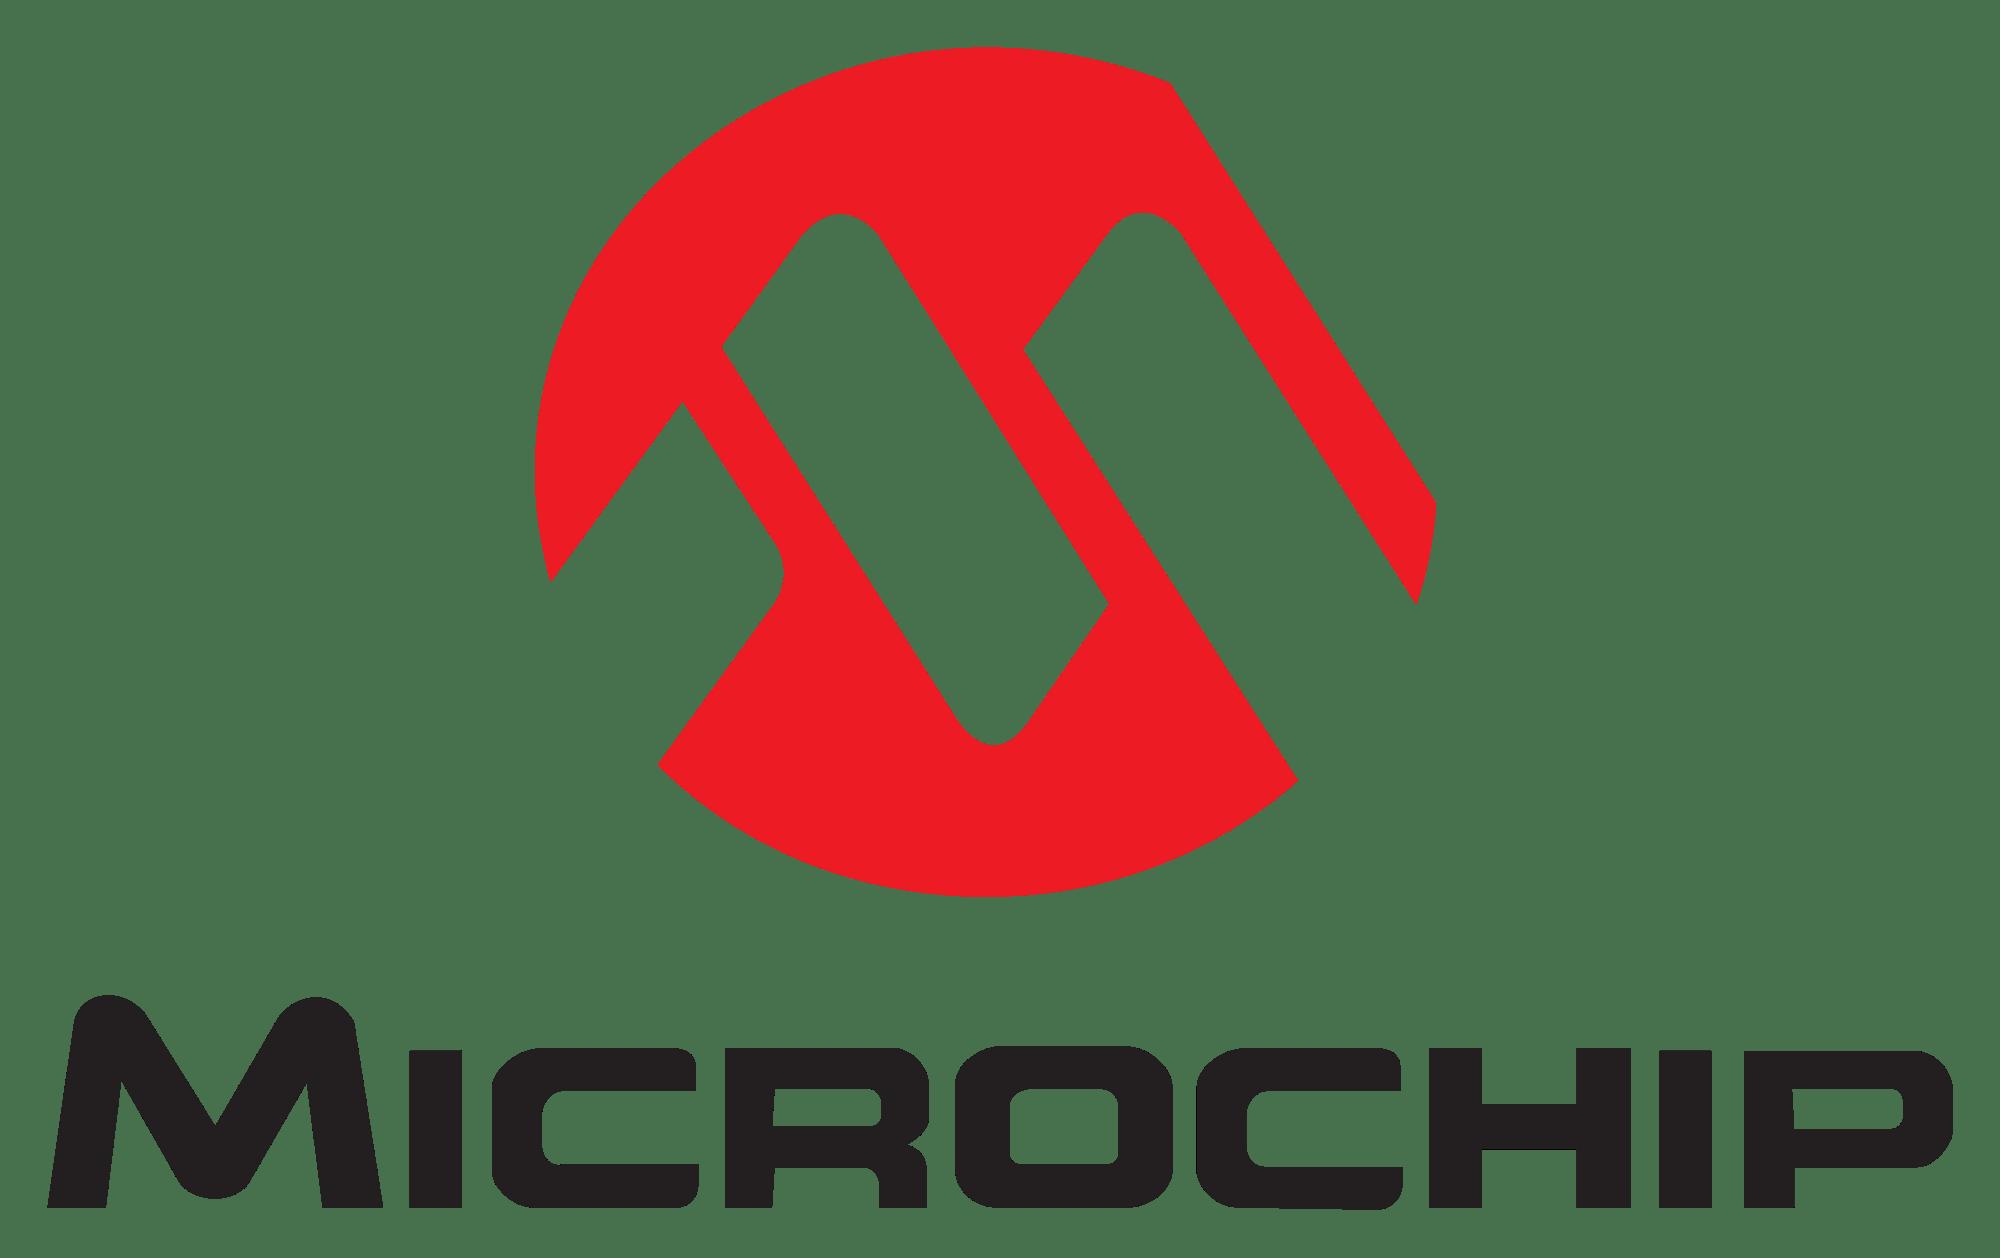 Microchip Company Logo transparent PNG.